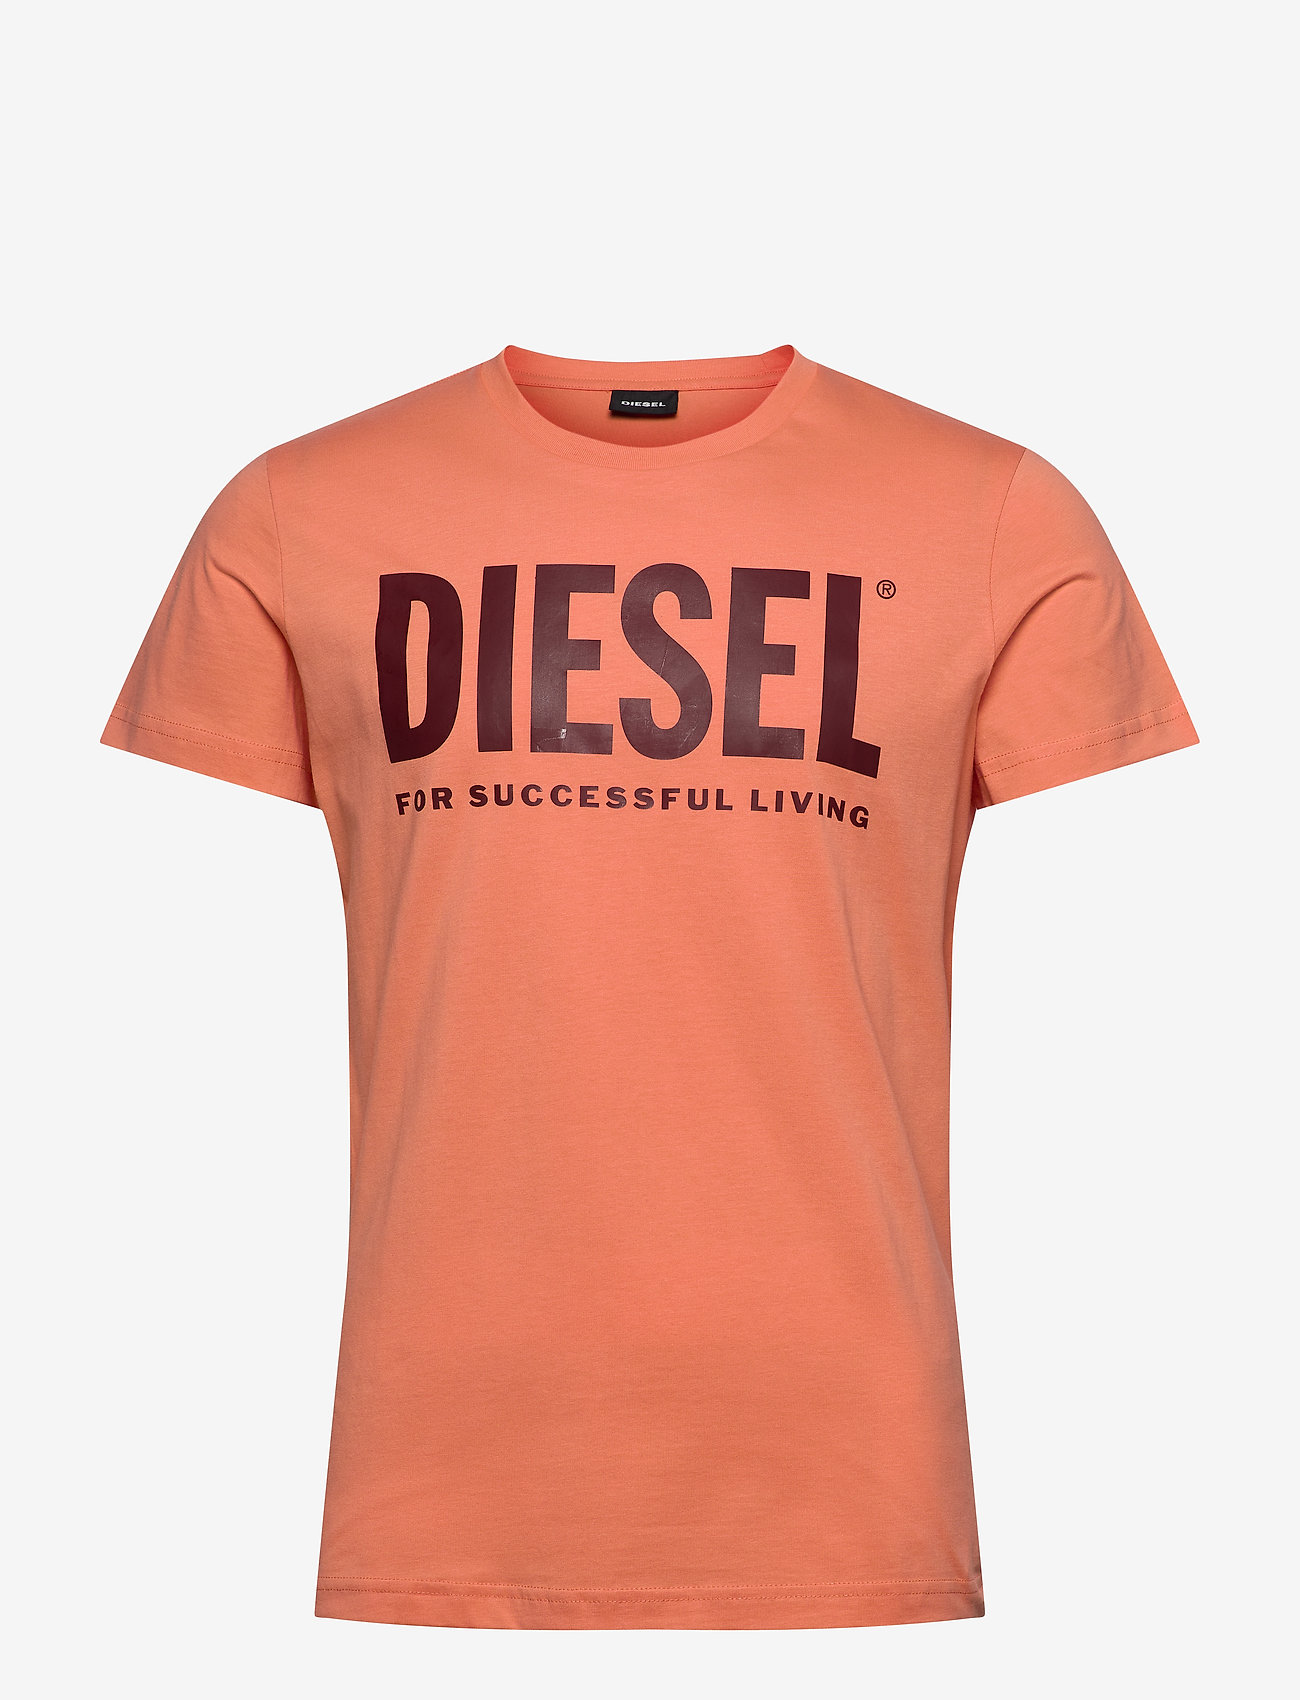 Diesel Men - T-DIEGO-LOGO T-SHIRT - short-sleeved t-shirts - orange - 0